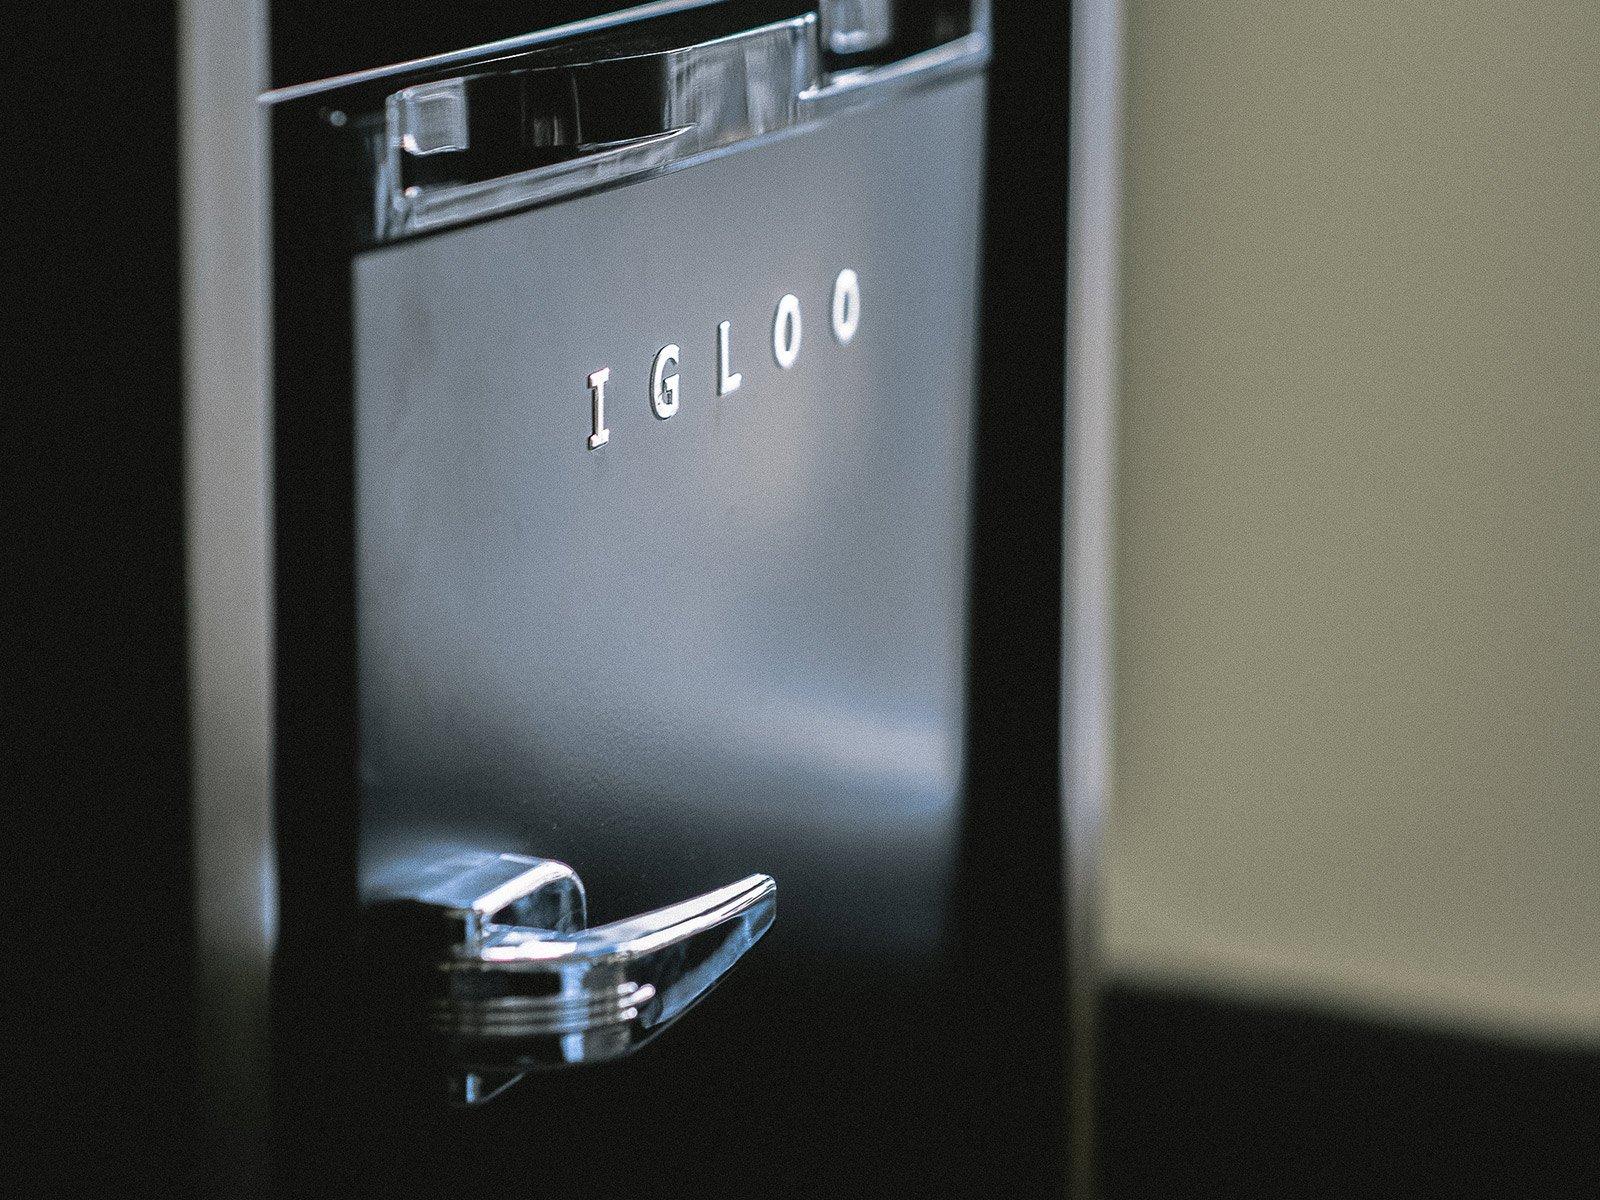 Black Igloo retro mini refrigerator in room at The Troubadour